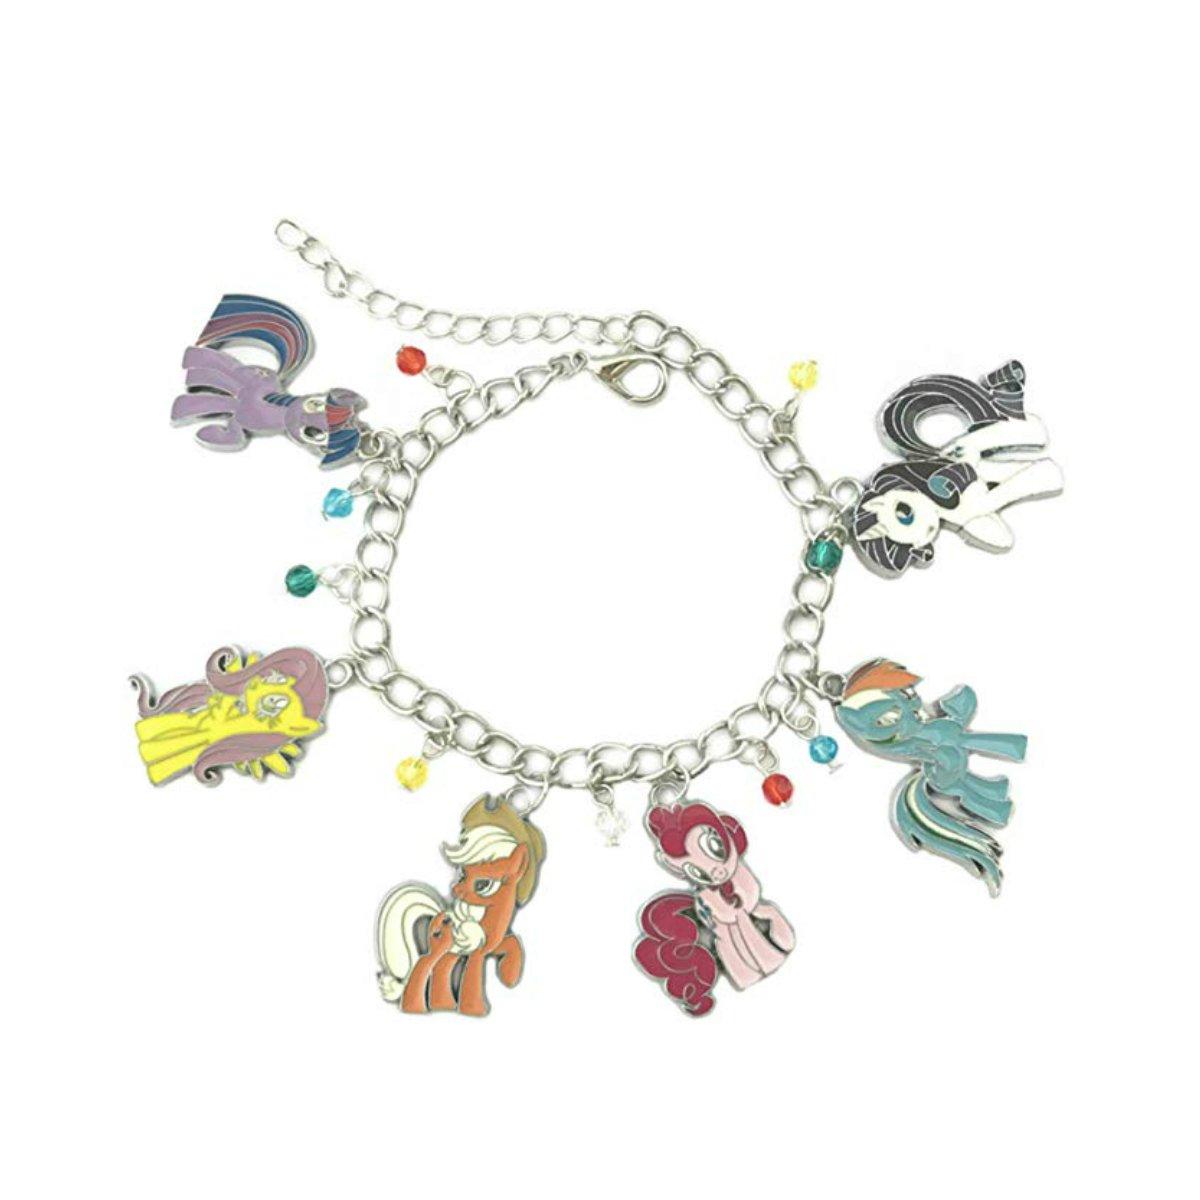 US FAMILY My Little Pony: Friendship is Magic Cartoon Theme Multi Charms Jewelry Bracelets Charm by Family Brands